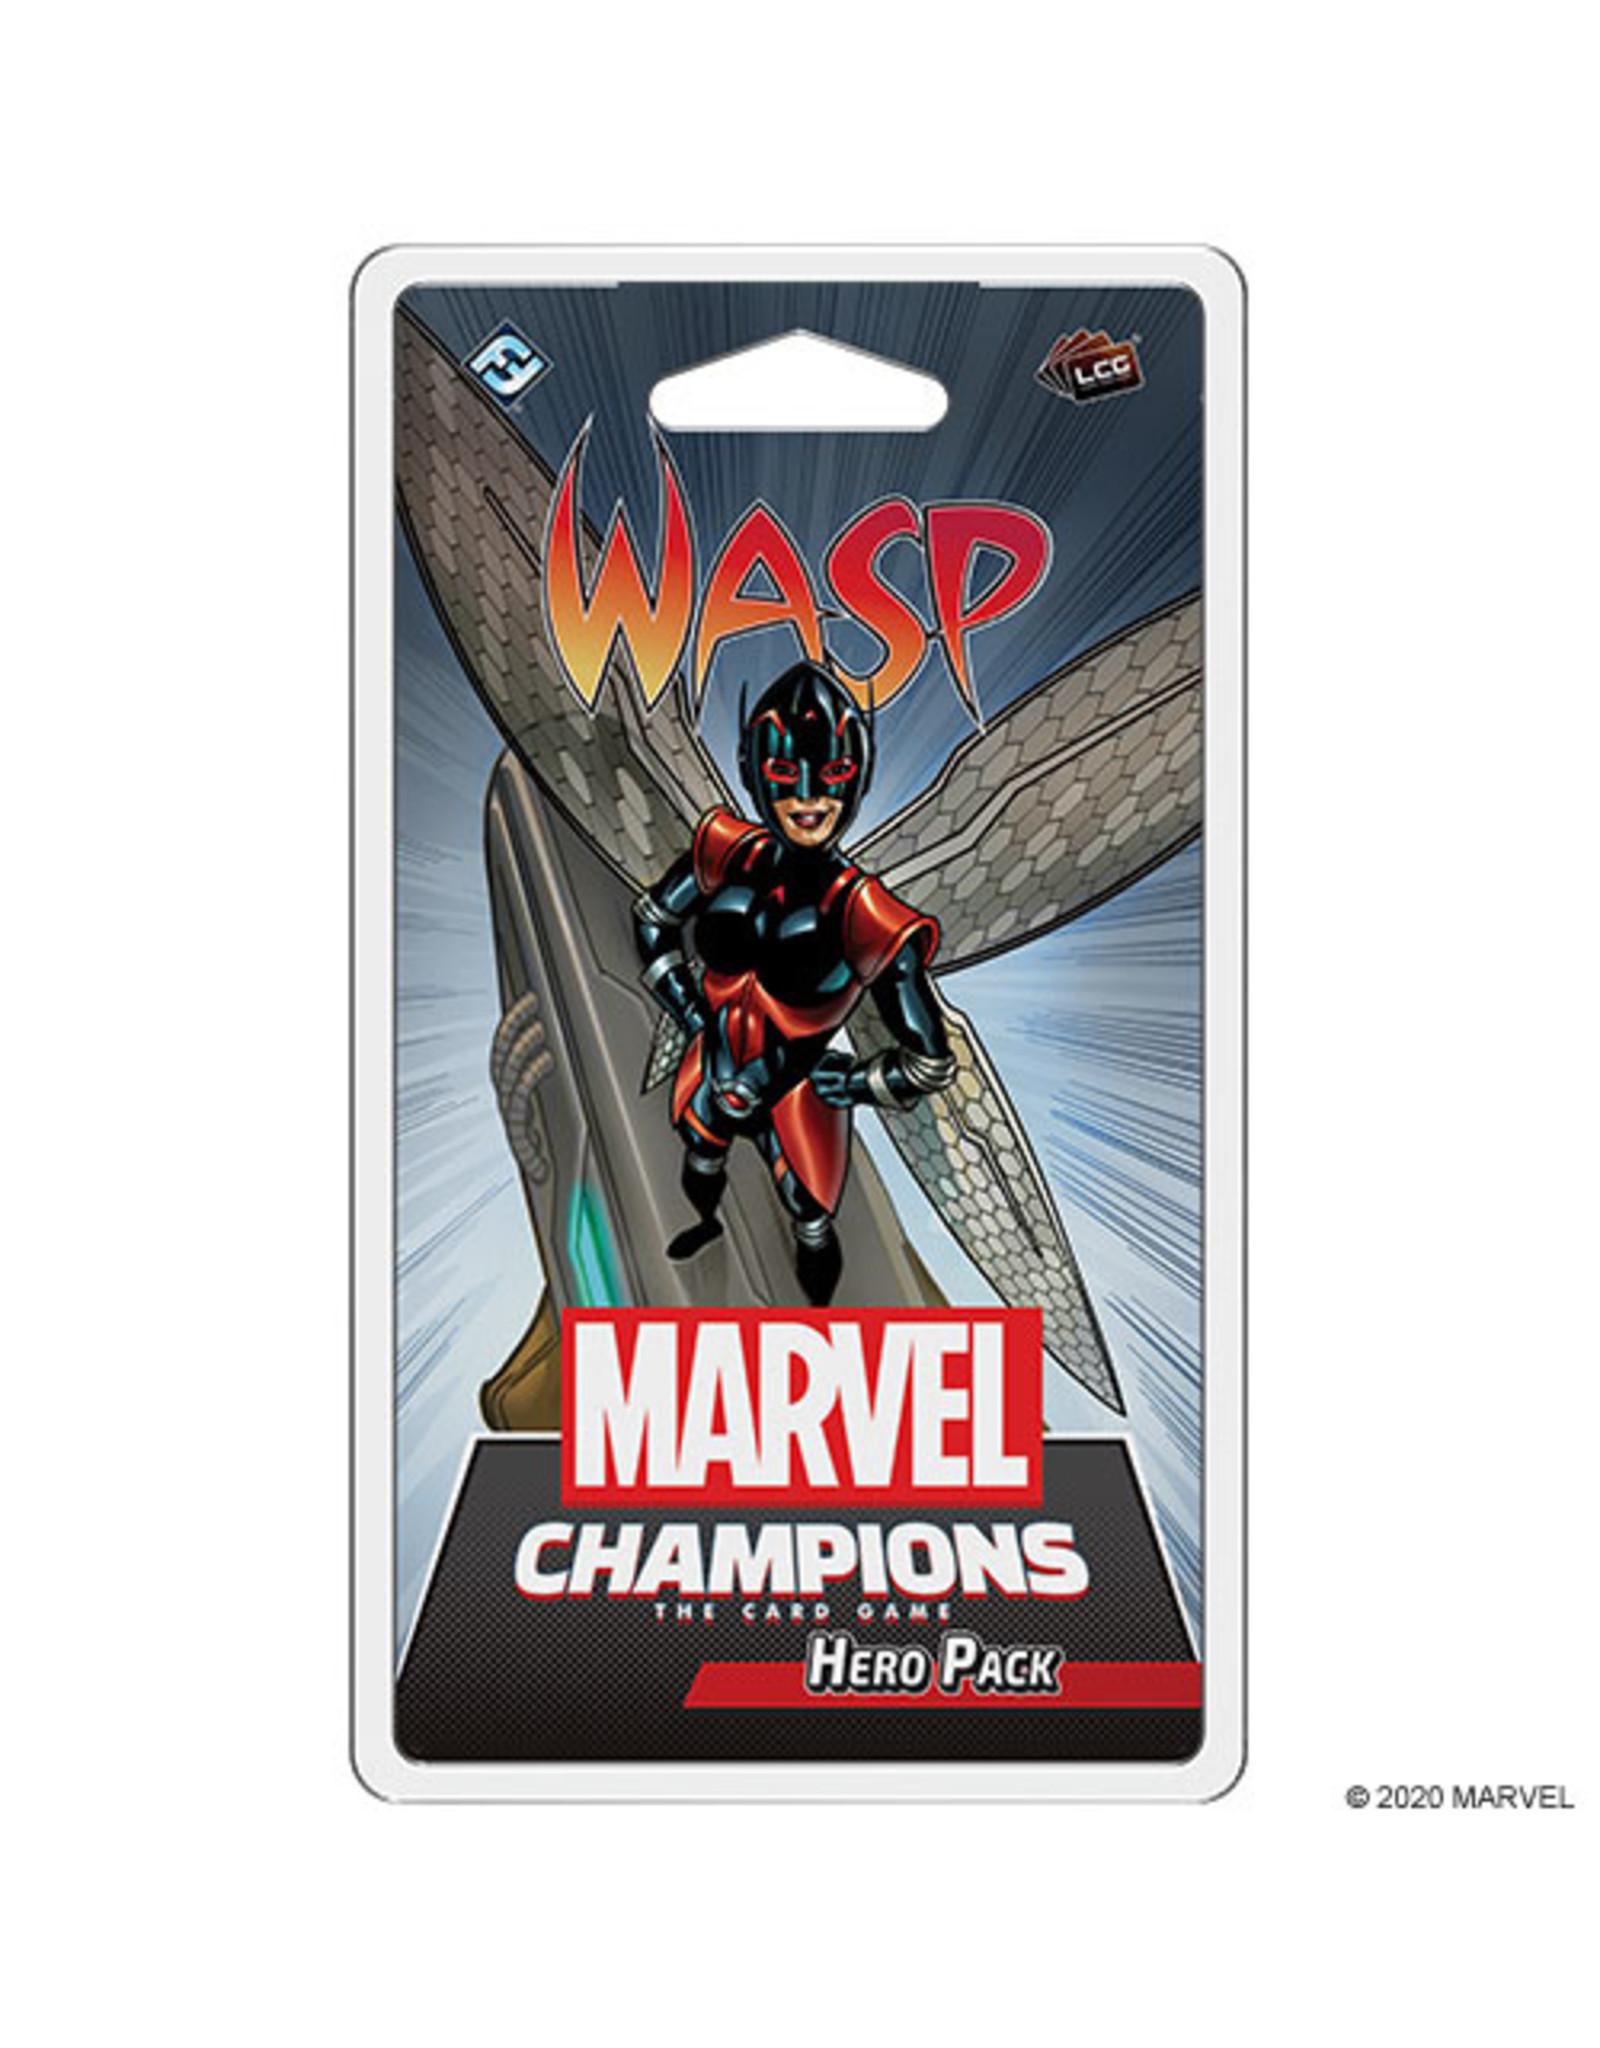 FANTASY FLIGHT GAMES MARVEL CHAMPIONS LCG: THE WASP HERO PACK PRE-ORDER